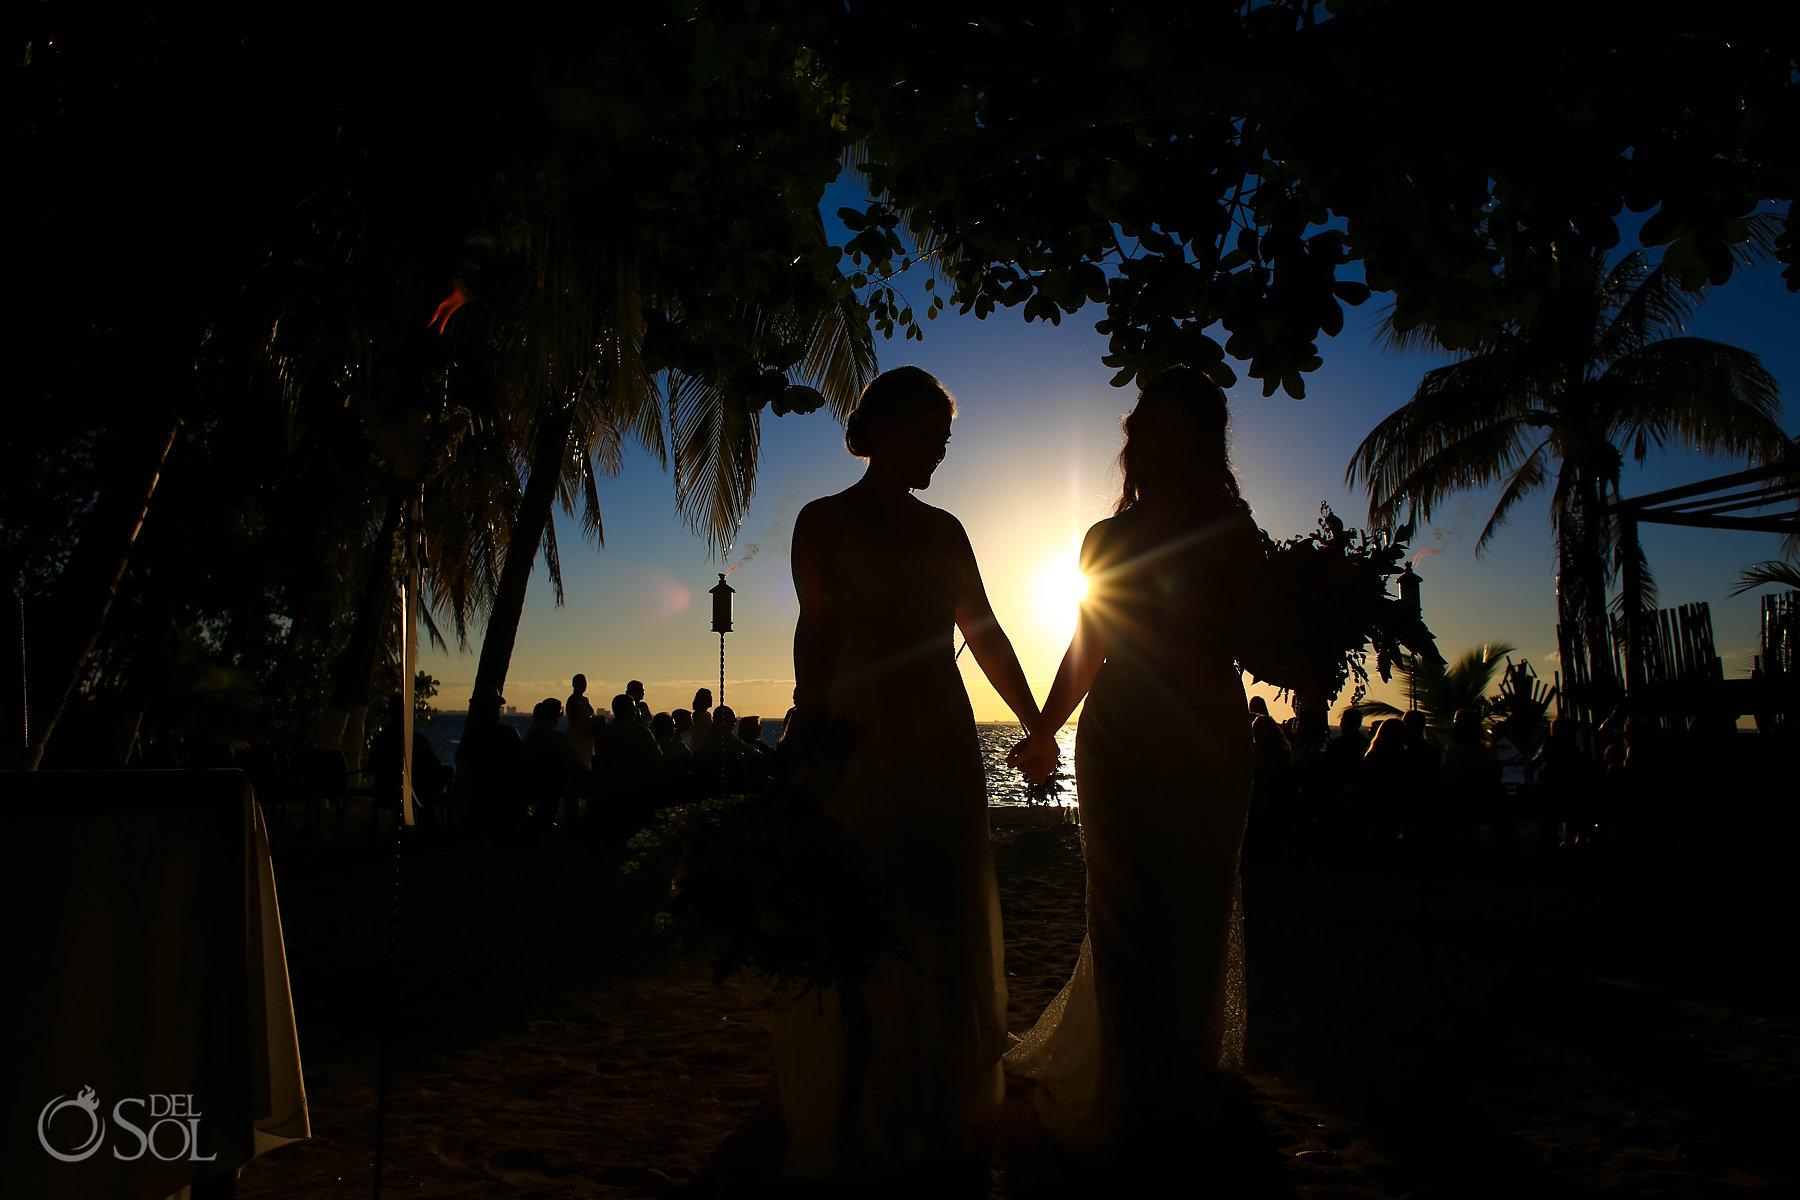 Just marriedbride and bride silhouette sunset Isla Mujeres lesbian wedding ceremony Zama Beach